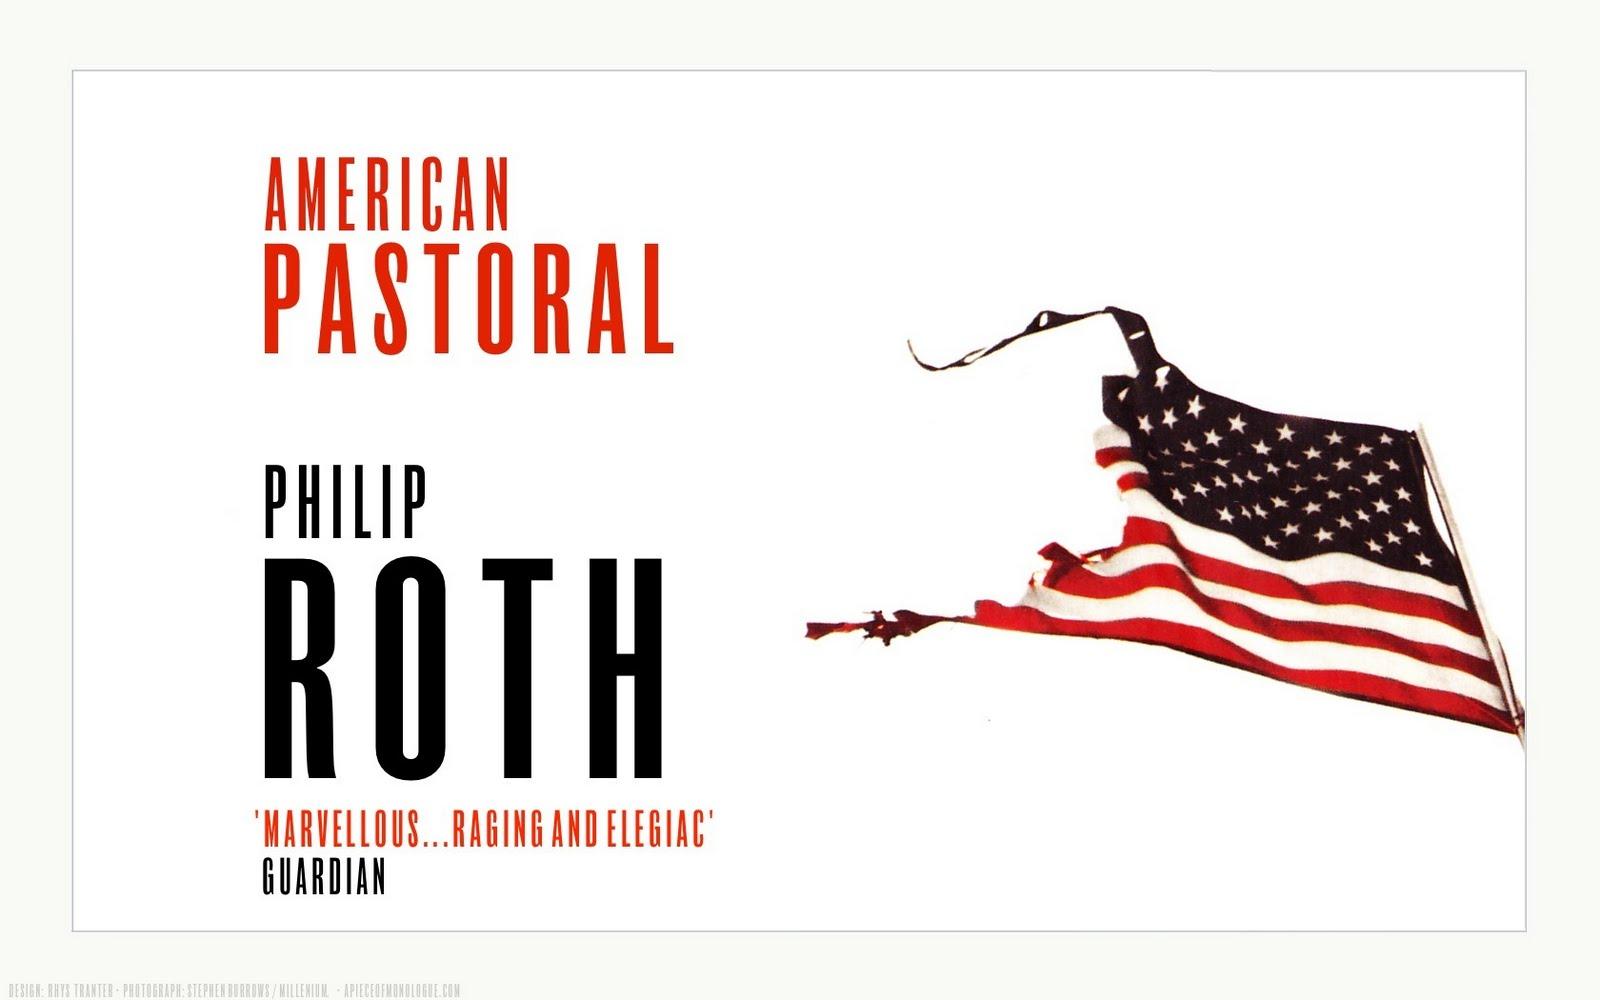 http://4.bp.blogspot.com/_N0TSGcQUzgU/TEGX1Emw8WI/AAAAAAAADXo/OotyibvPGDs/s1600/PhilipRoth_AmericanPastoral_Wallpaper.jpg